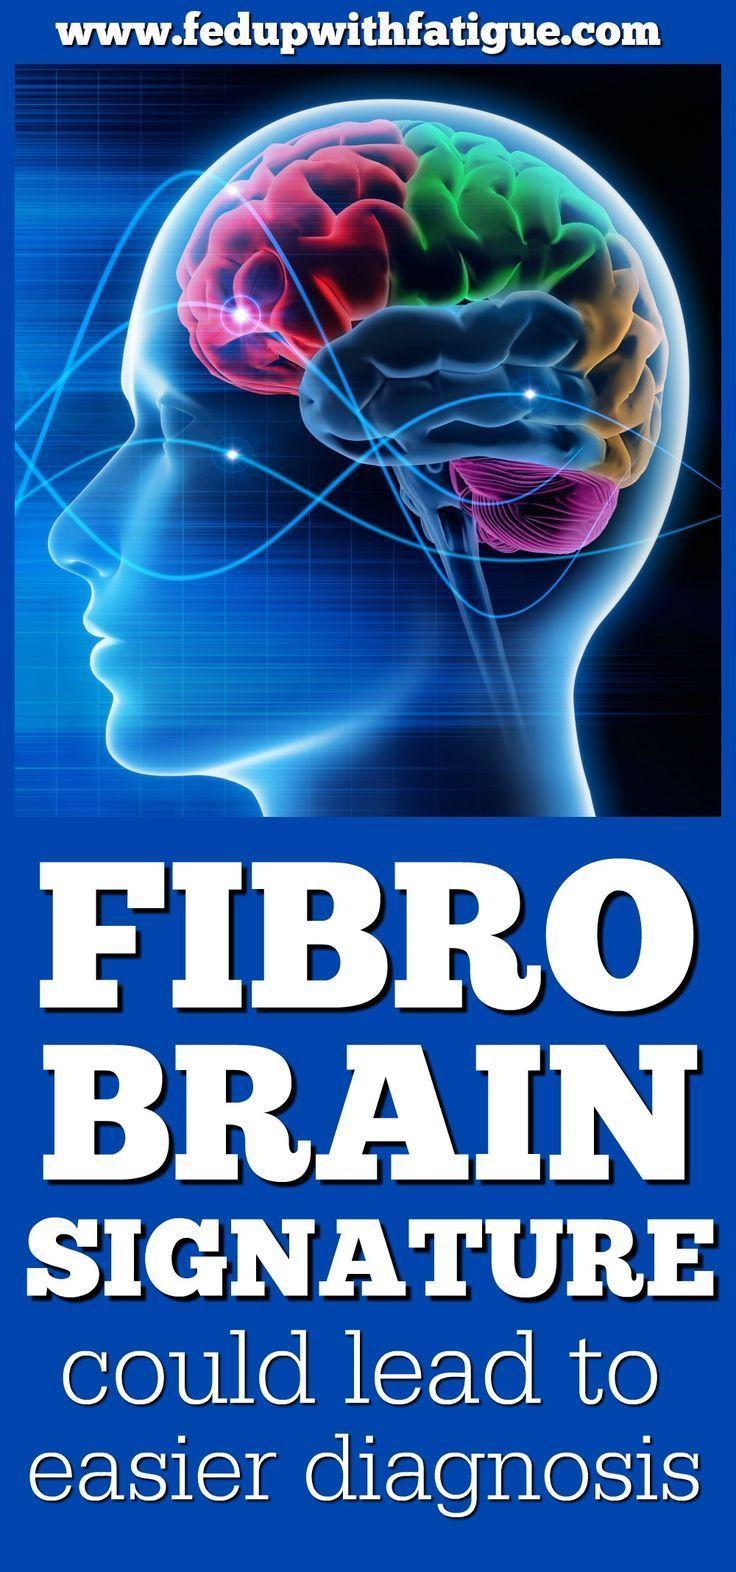 Colour therapy for fibromyalgia - Unique Fibromyalgia Brain Signature Could Lead To Easier Diagnosis